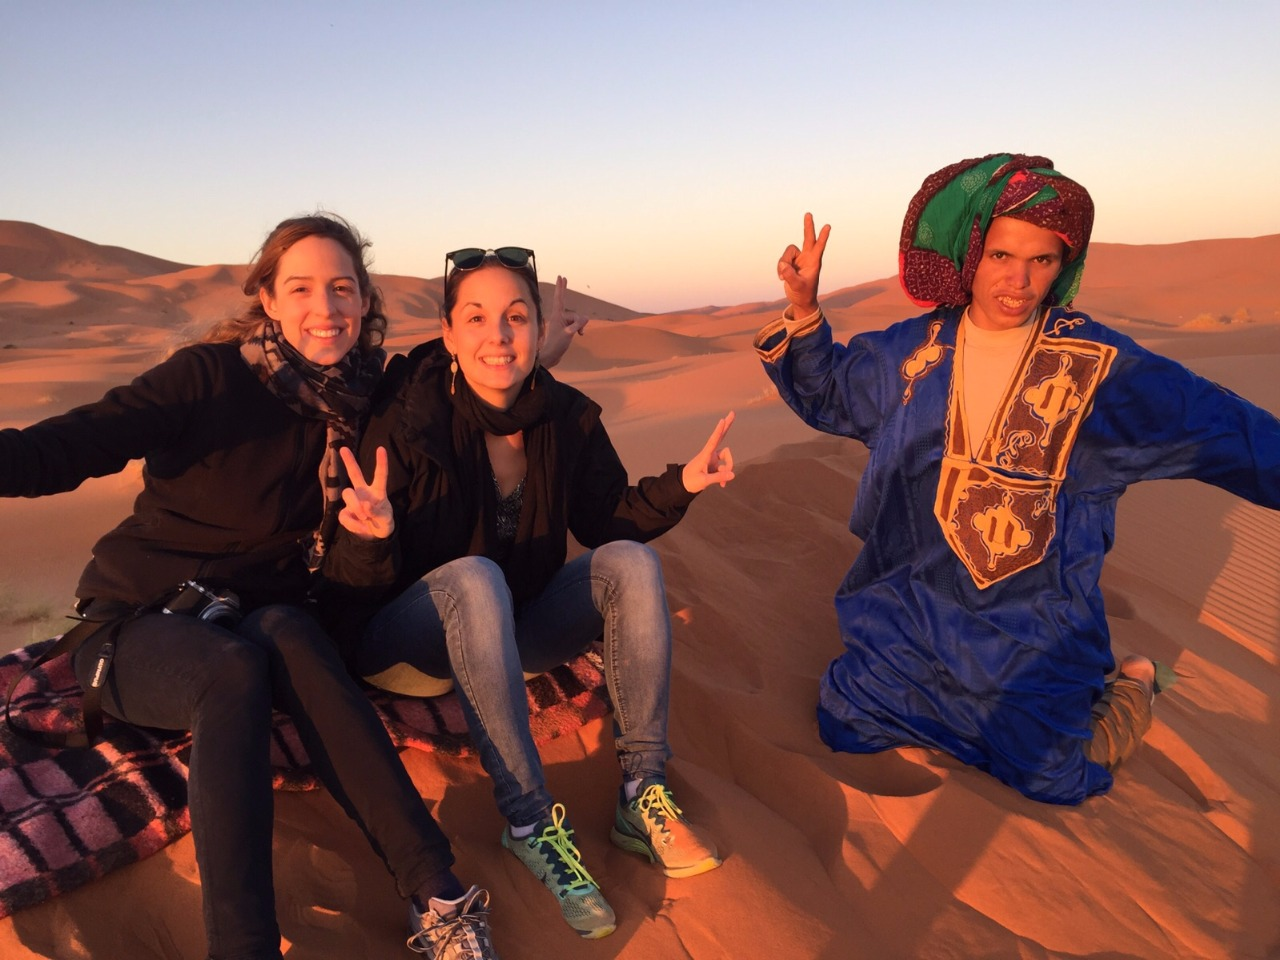 Desierto Marruecos viajes Marrakech